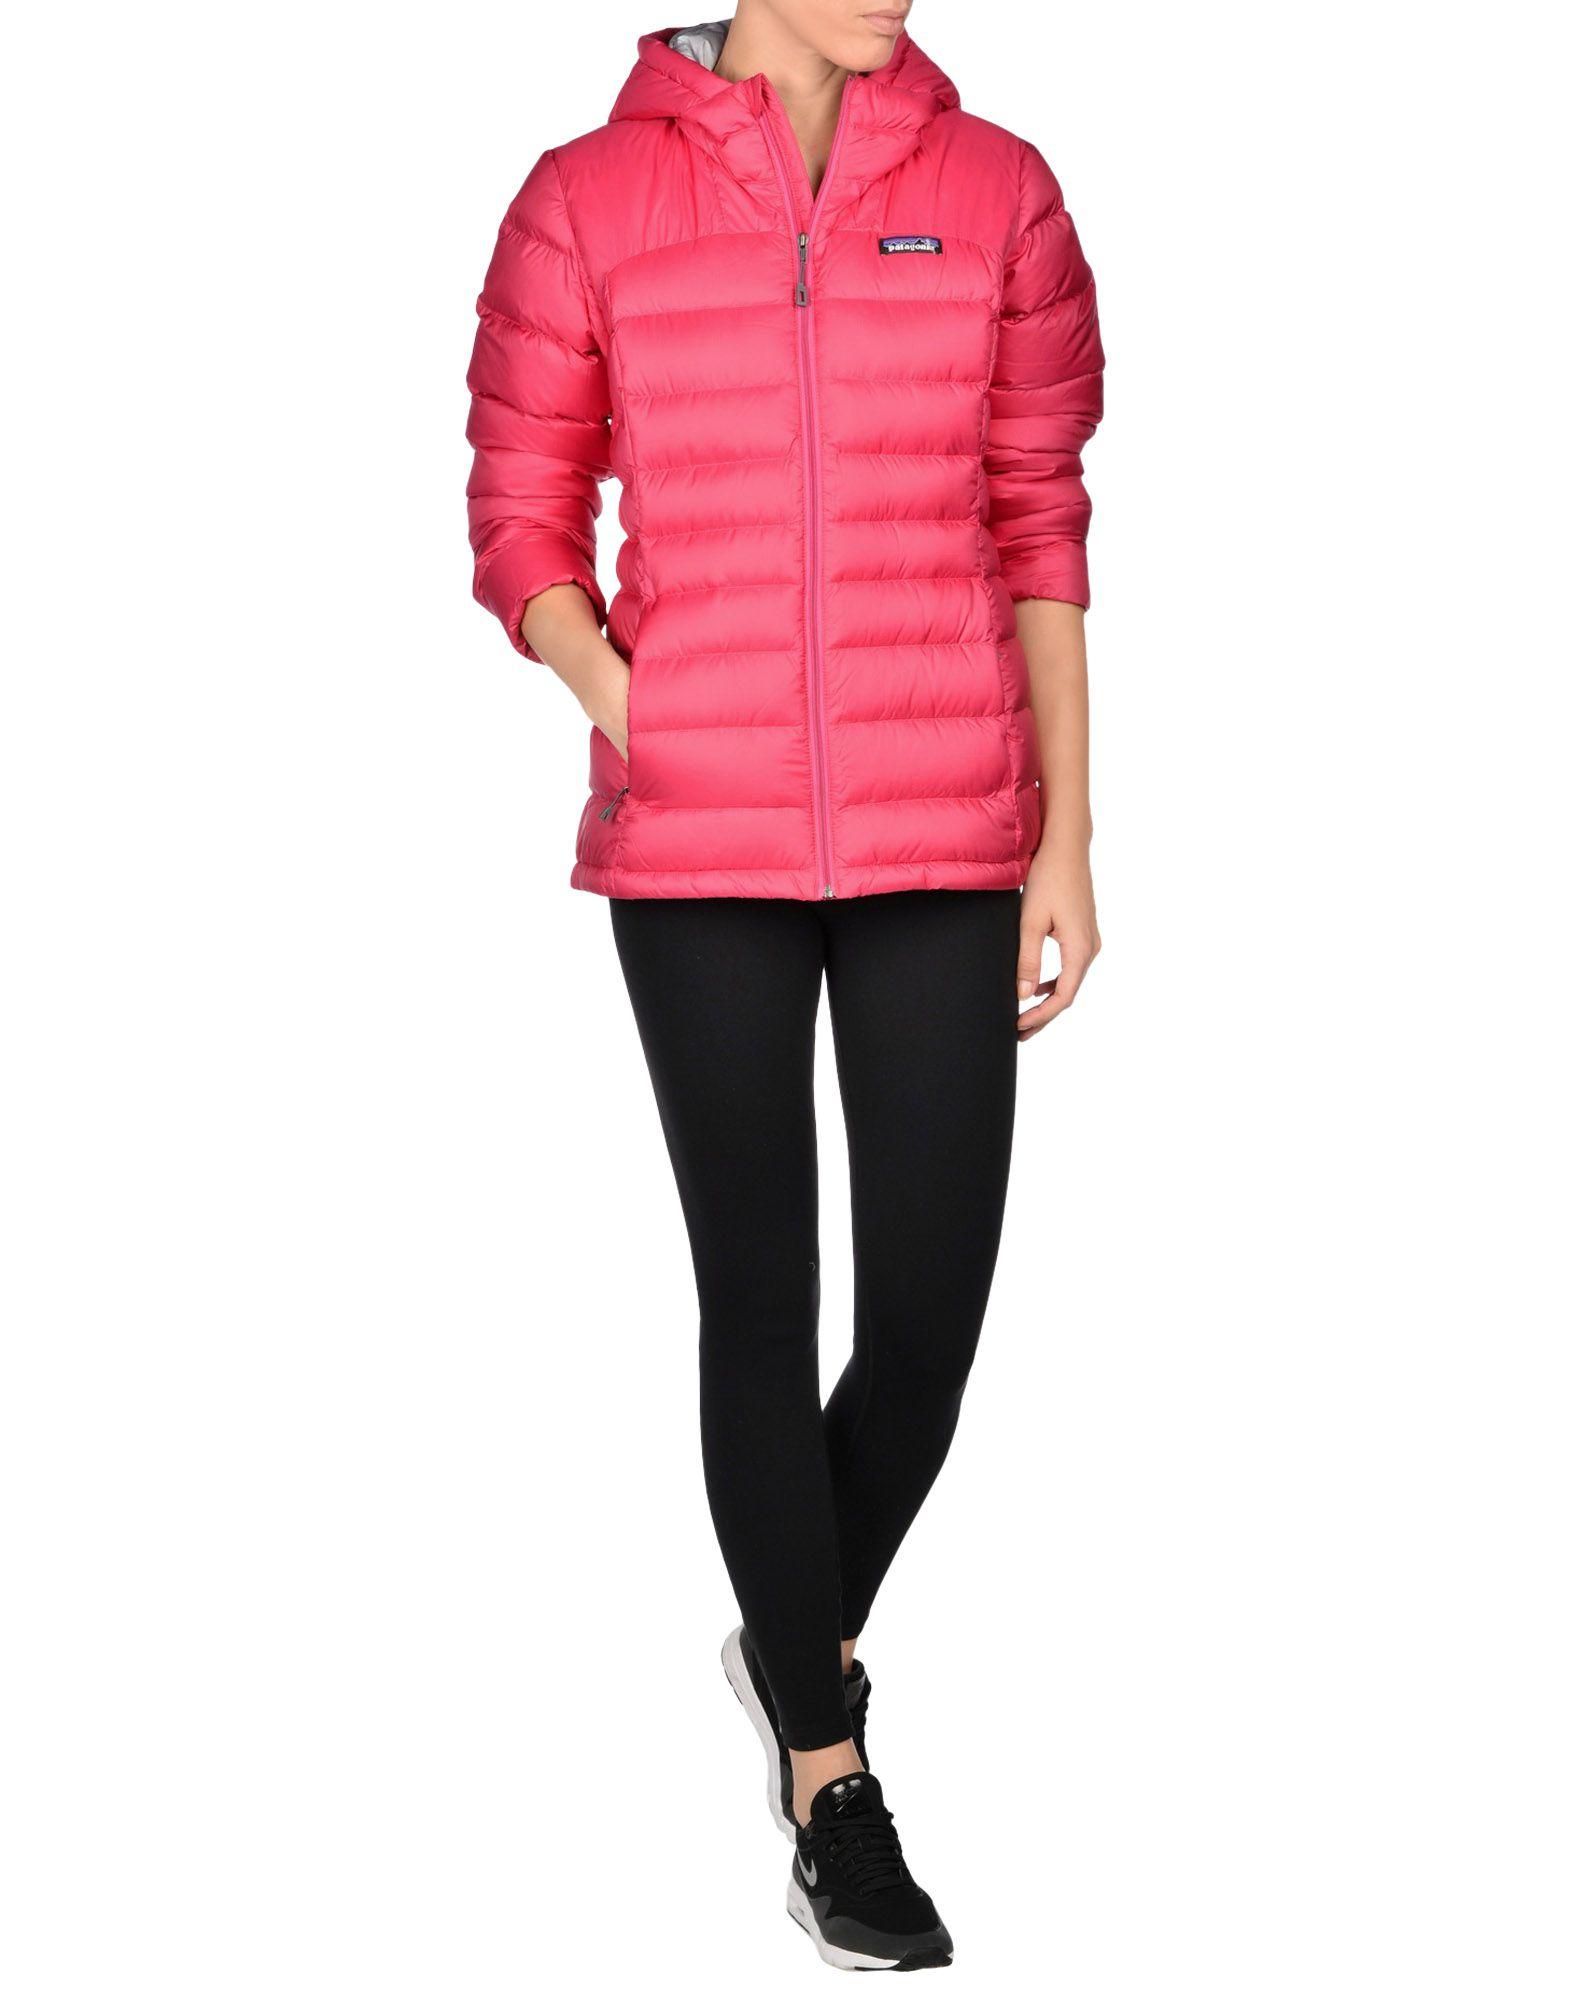 patagonia single girls 278 shopcom uk results found for patagonia, clothes including patagonia torrentshell jacket - pink, pink patagonia baggies pants women's patagonia quandary pants.